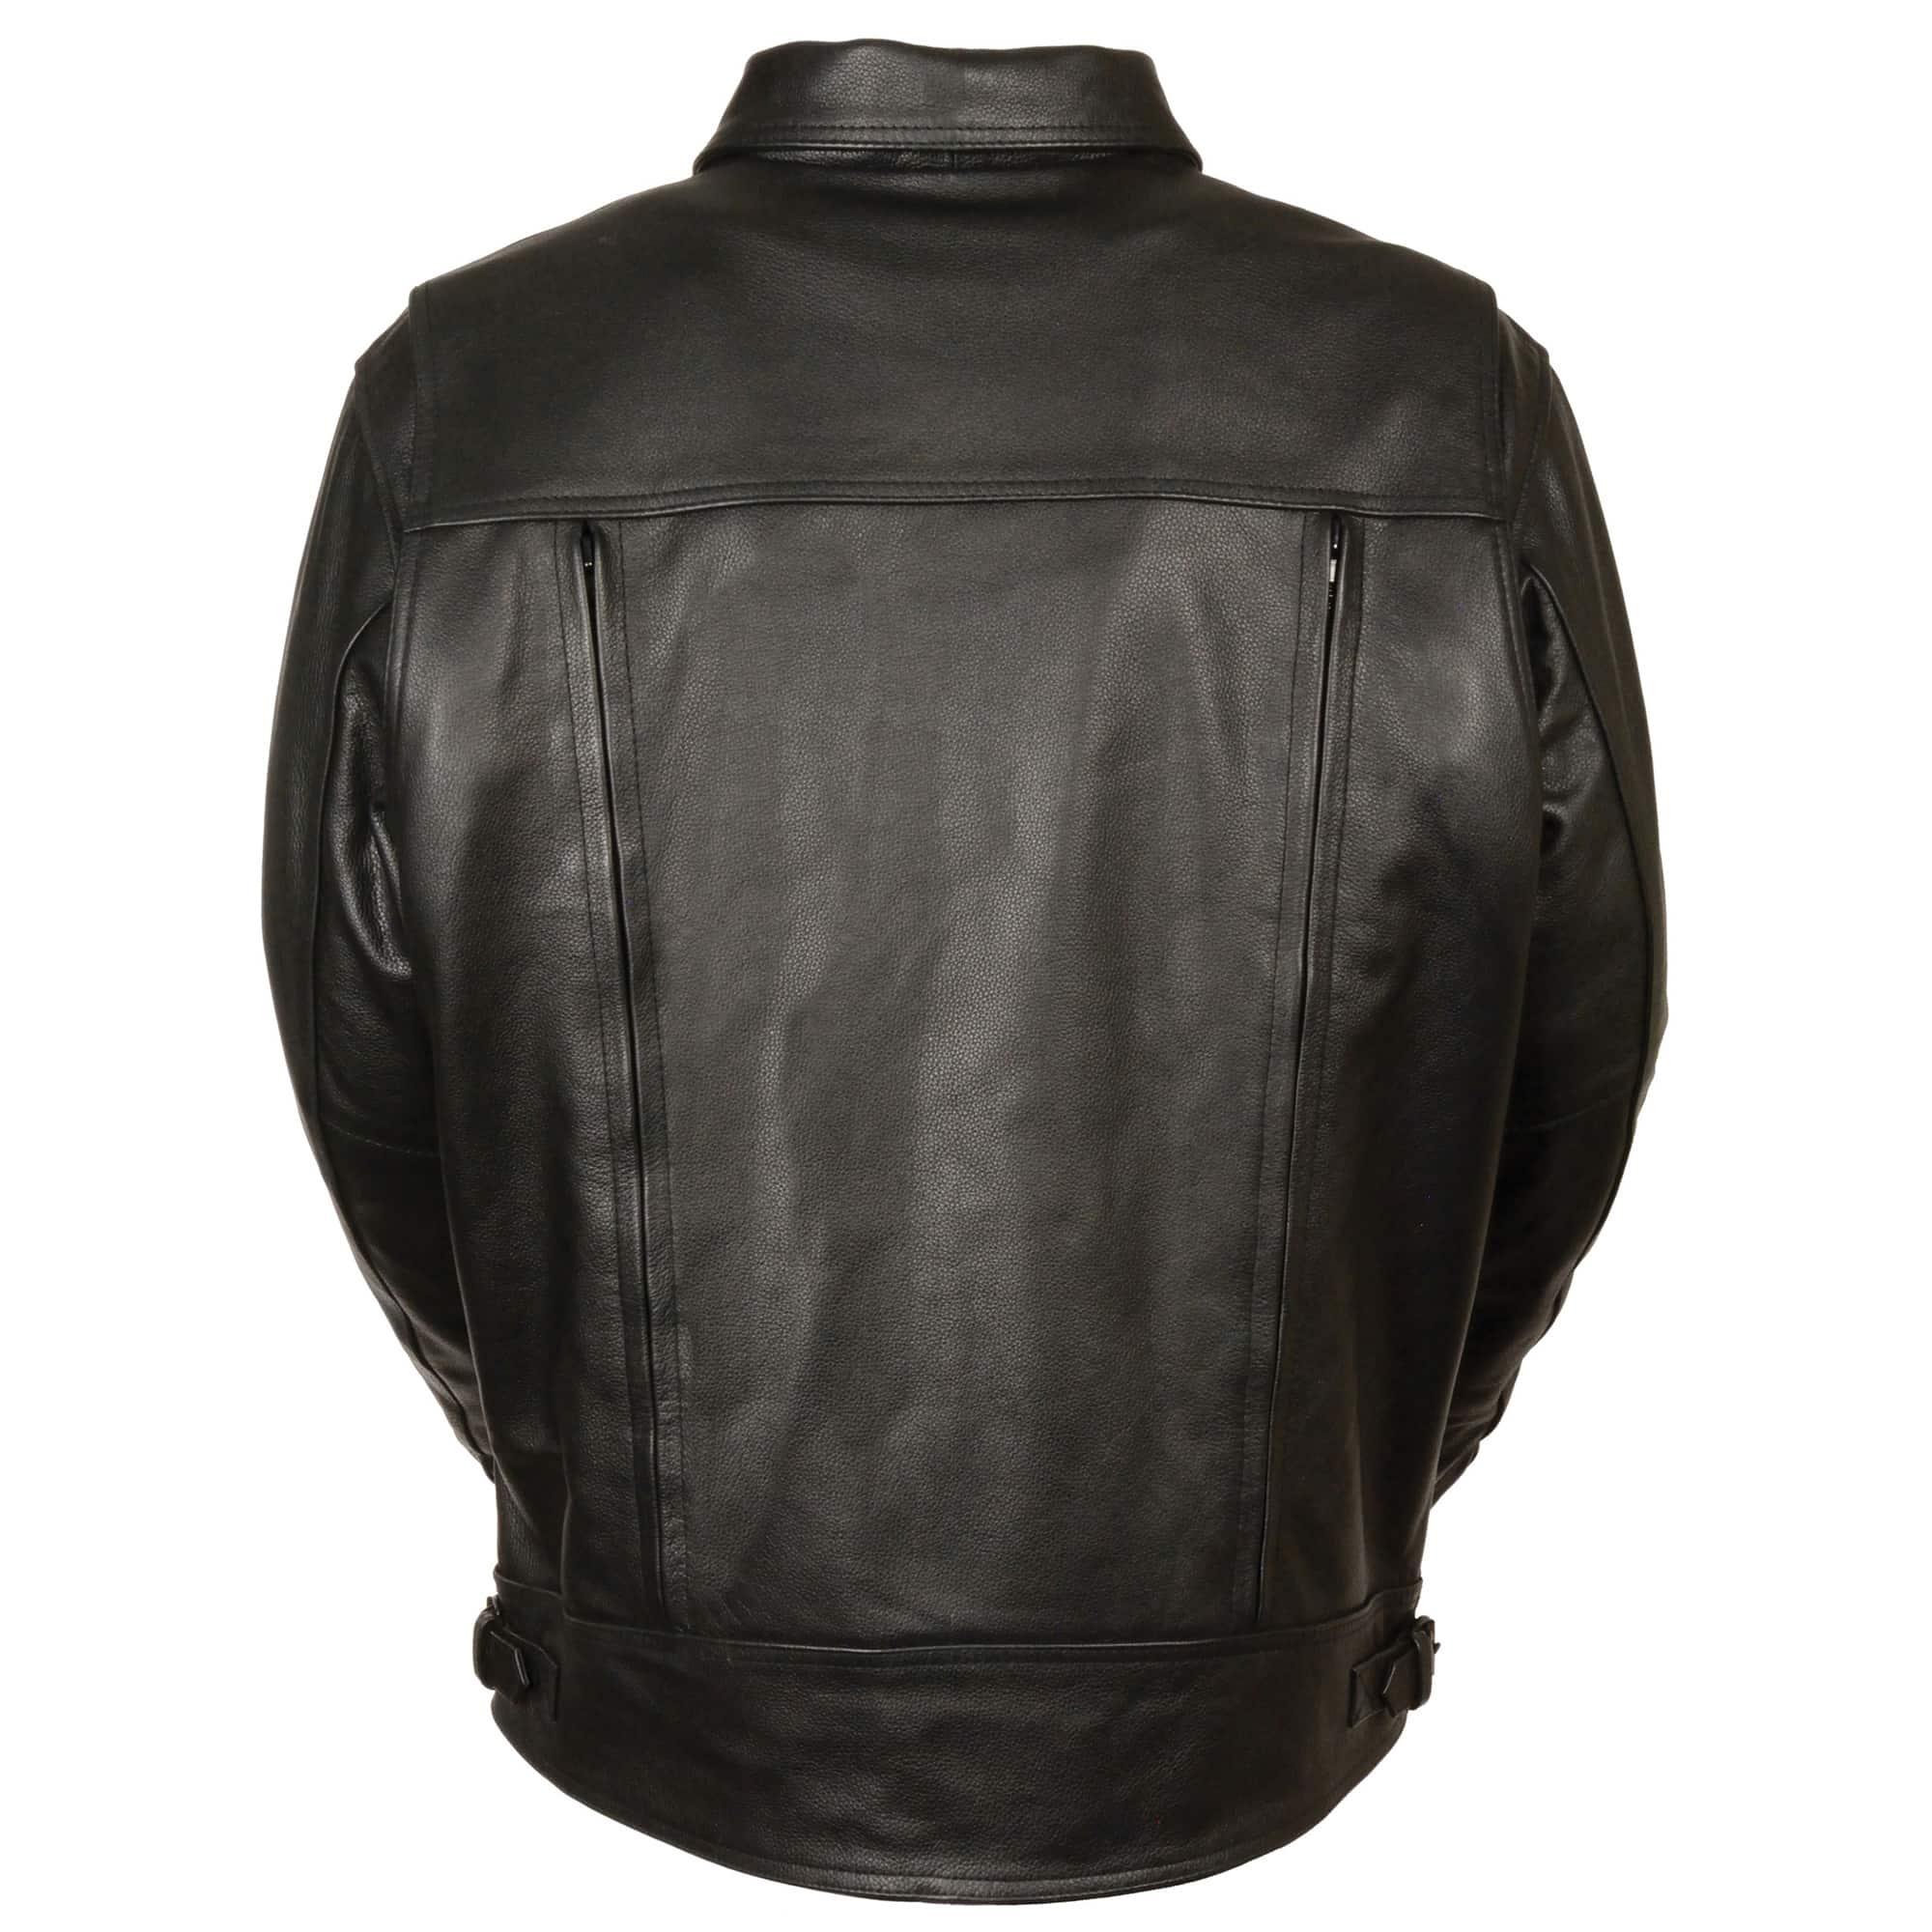 Mens Leather Utility Pocket Vented Cruiser Jacket